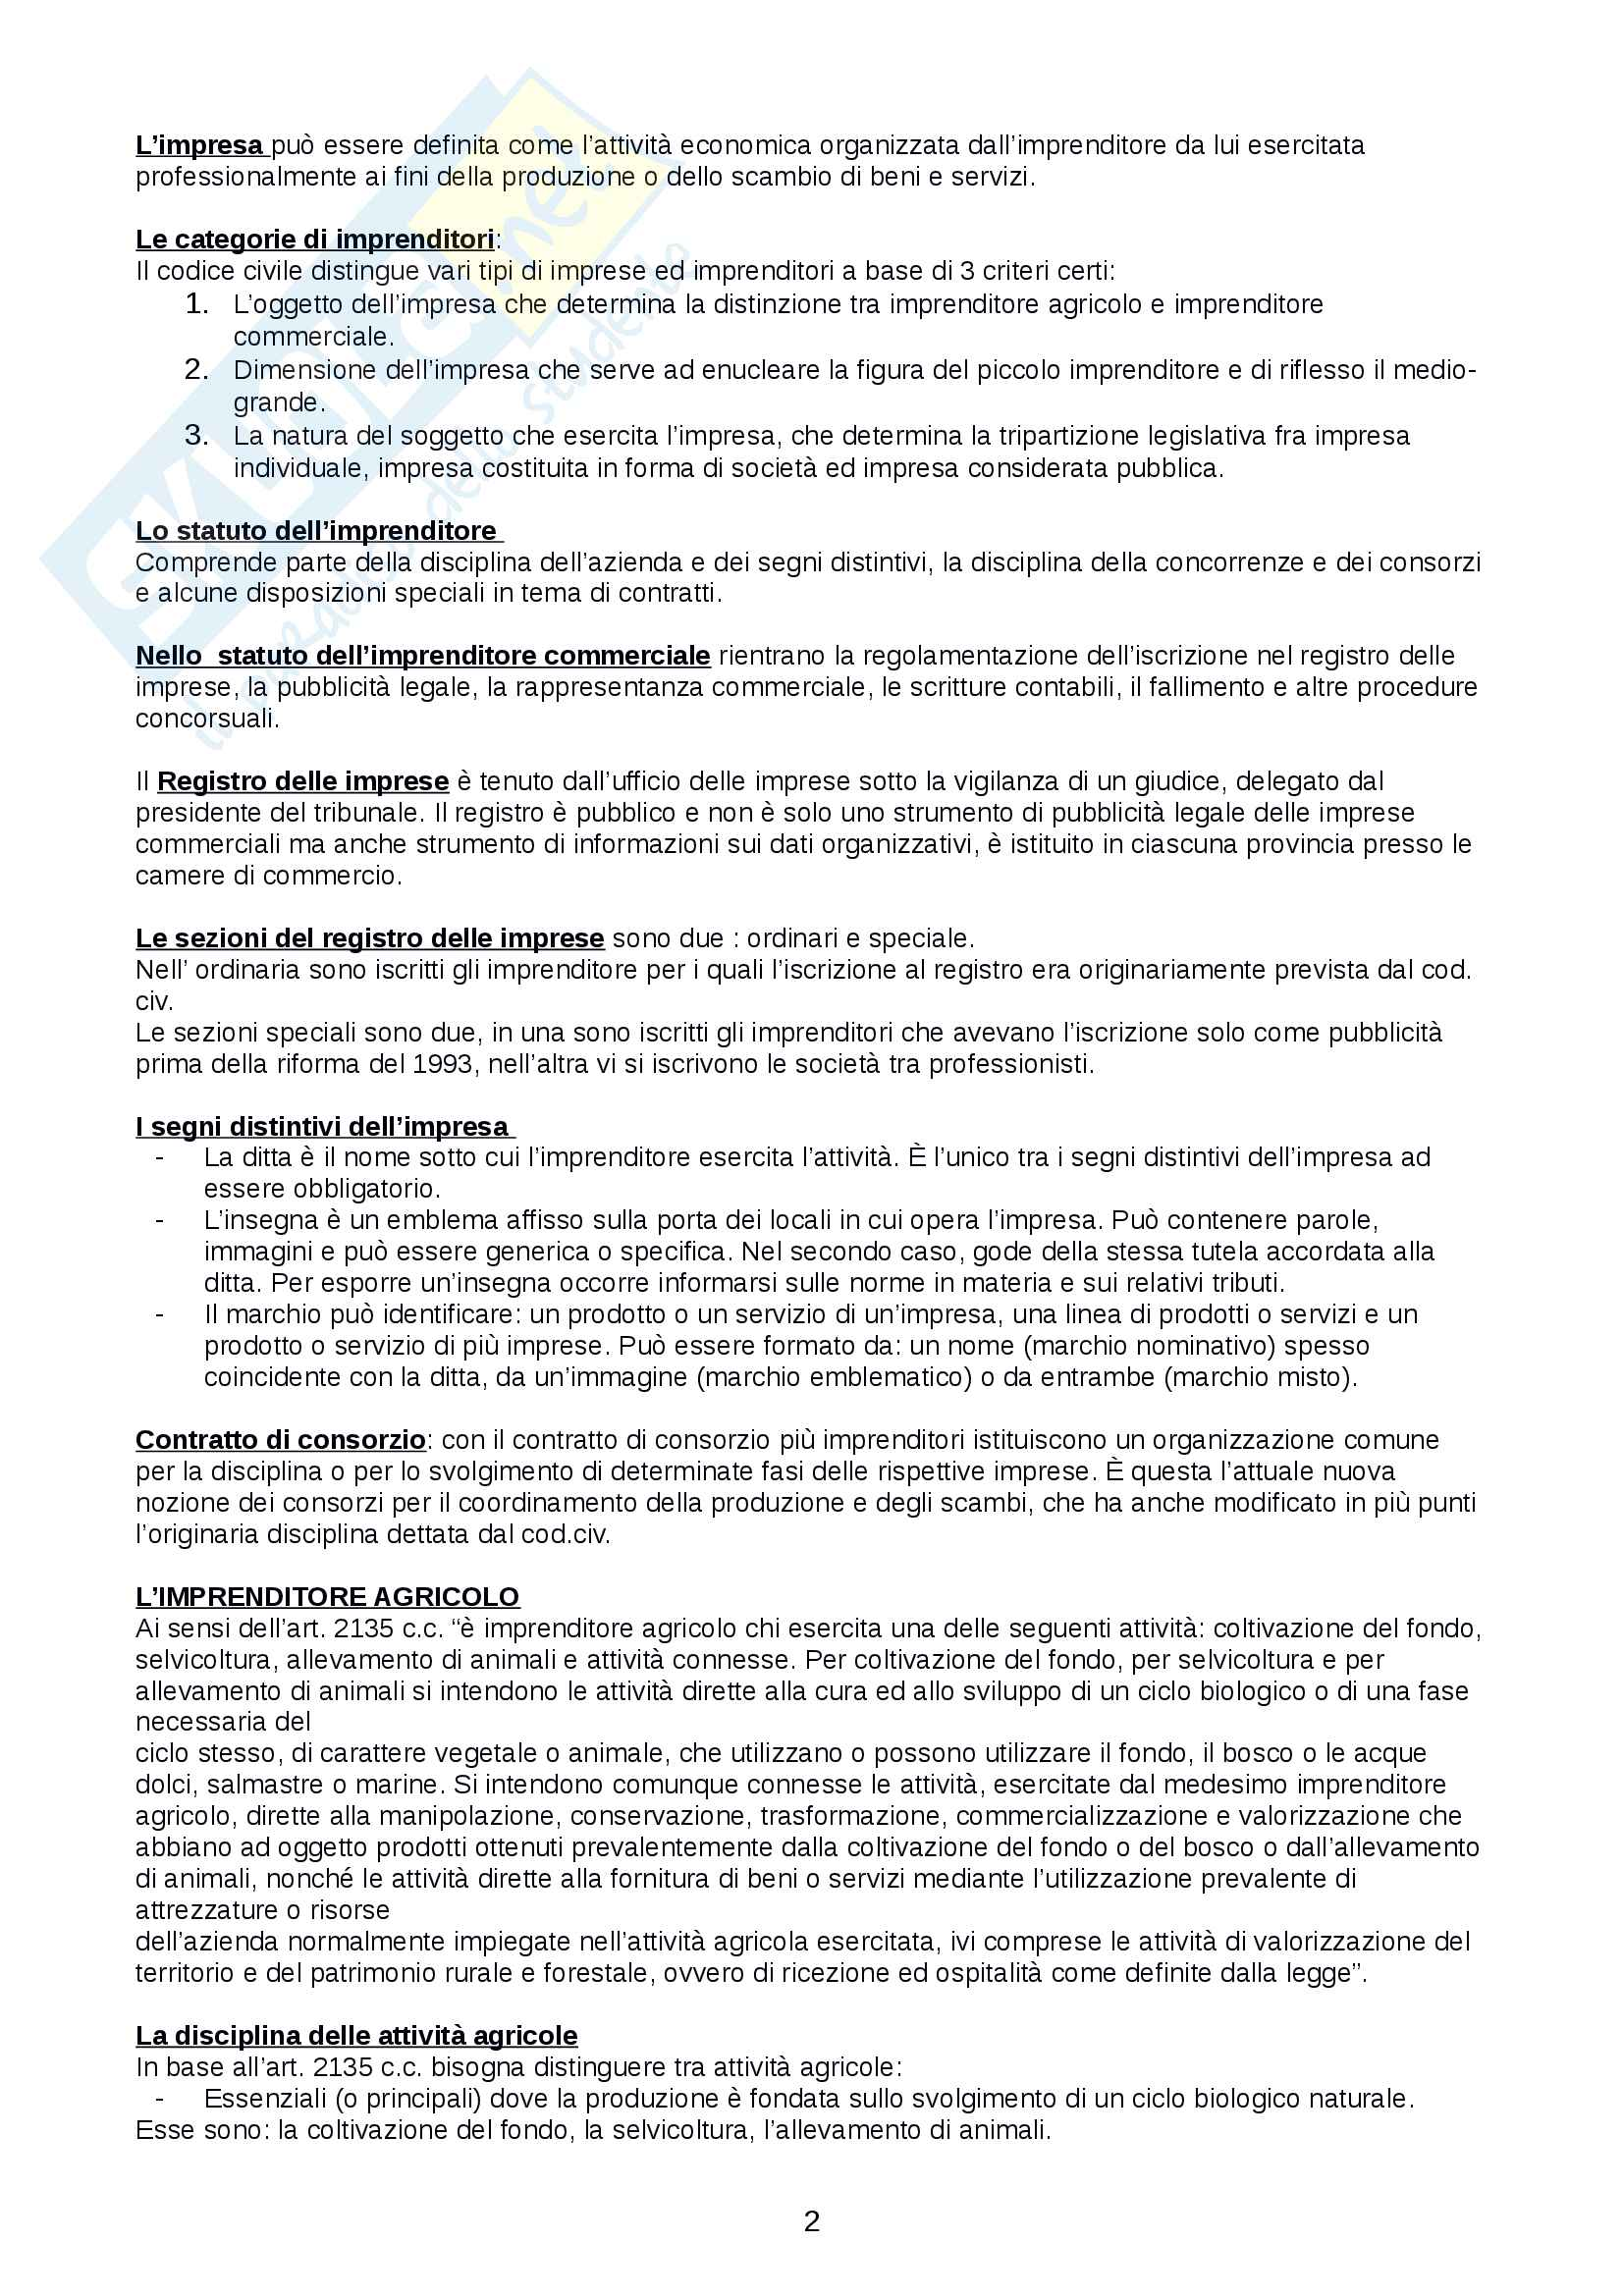 Diritto commerciale appunti Pag. 2